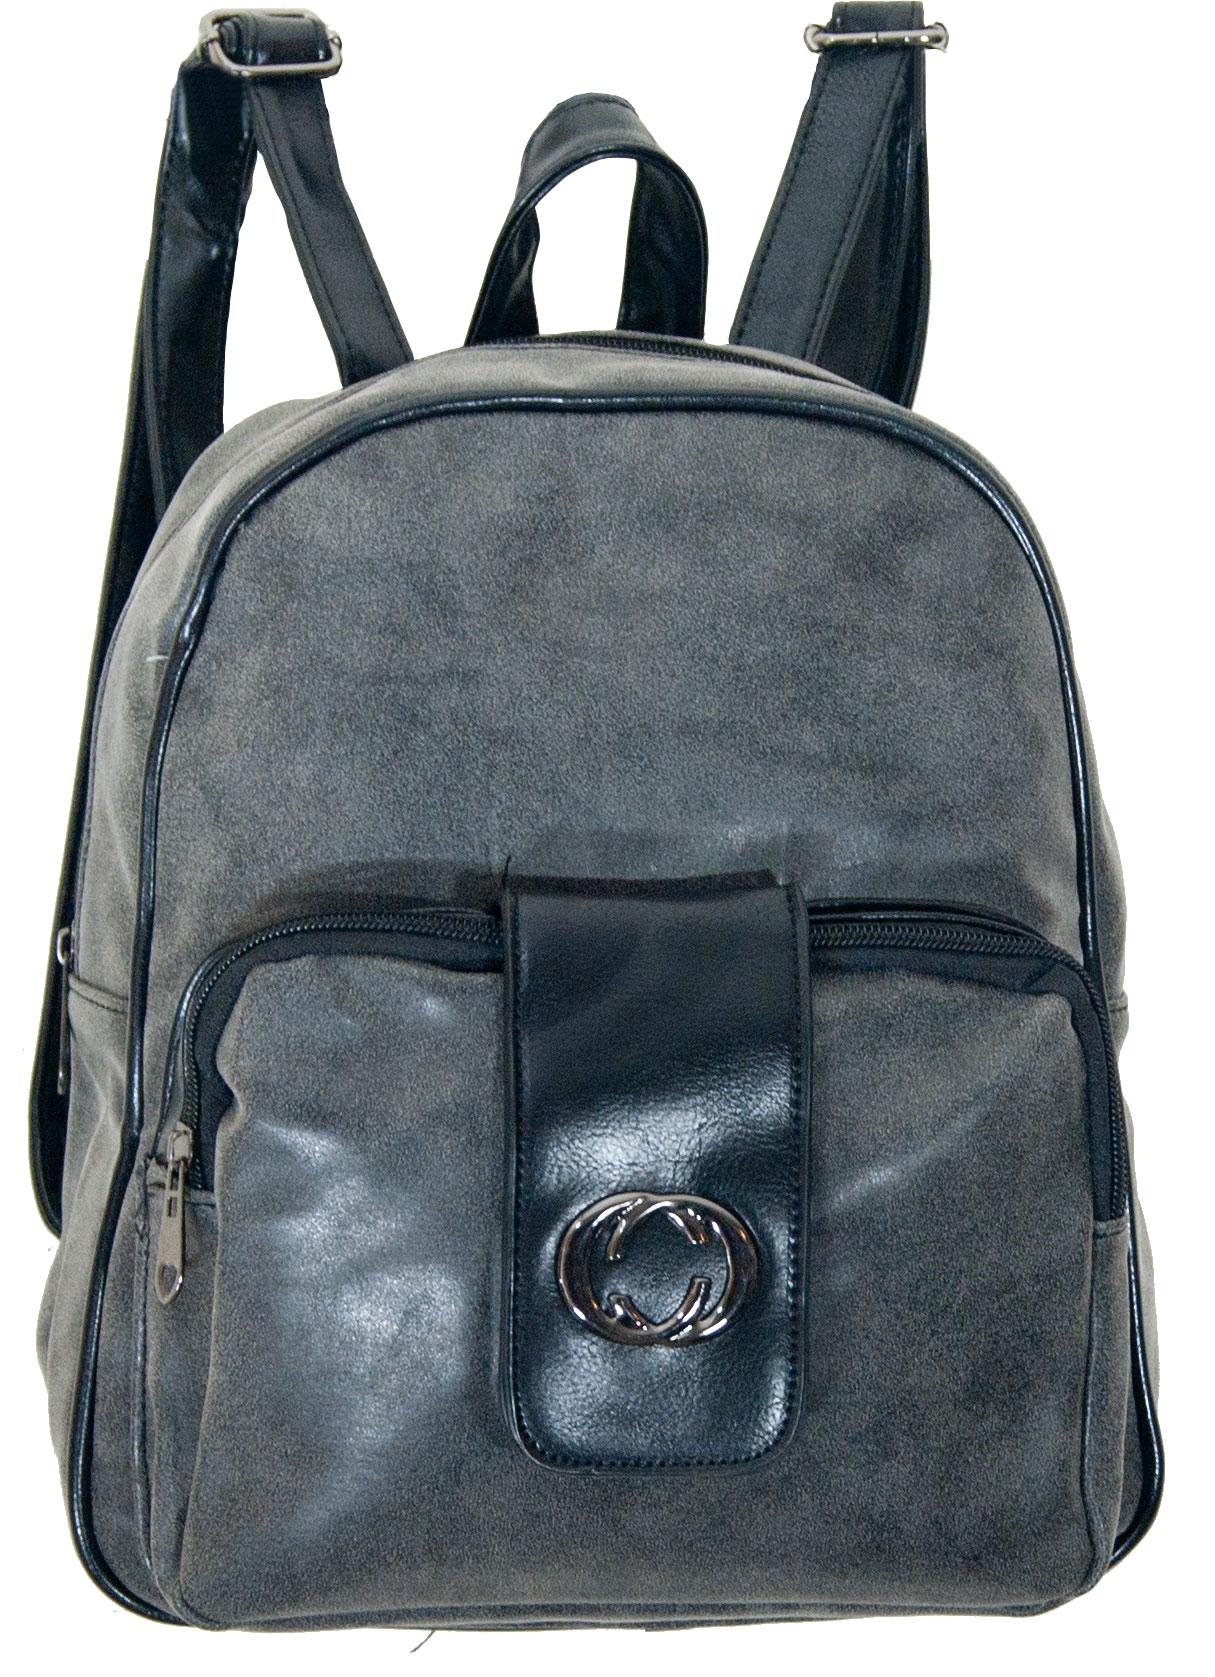 Backpack No 696 - Γκρι (Silvio 696)